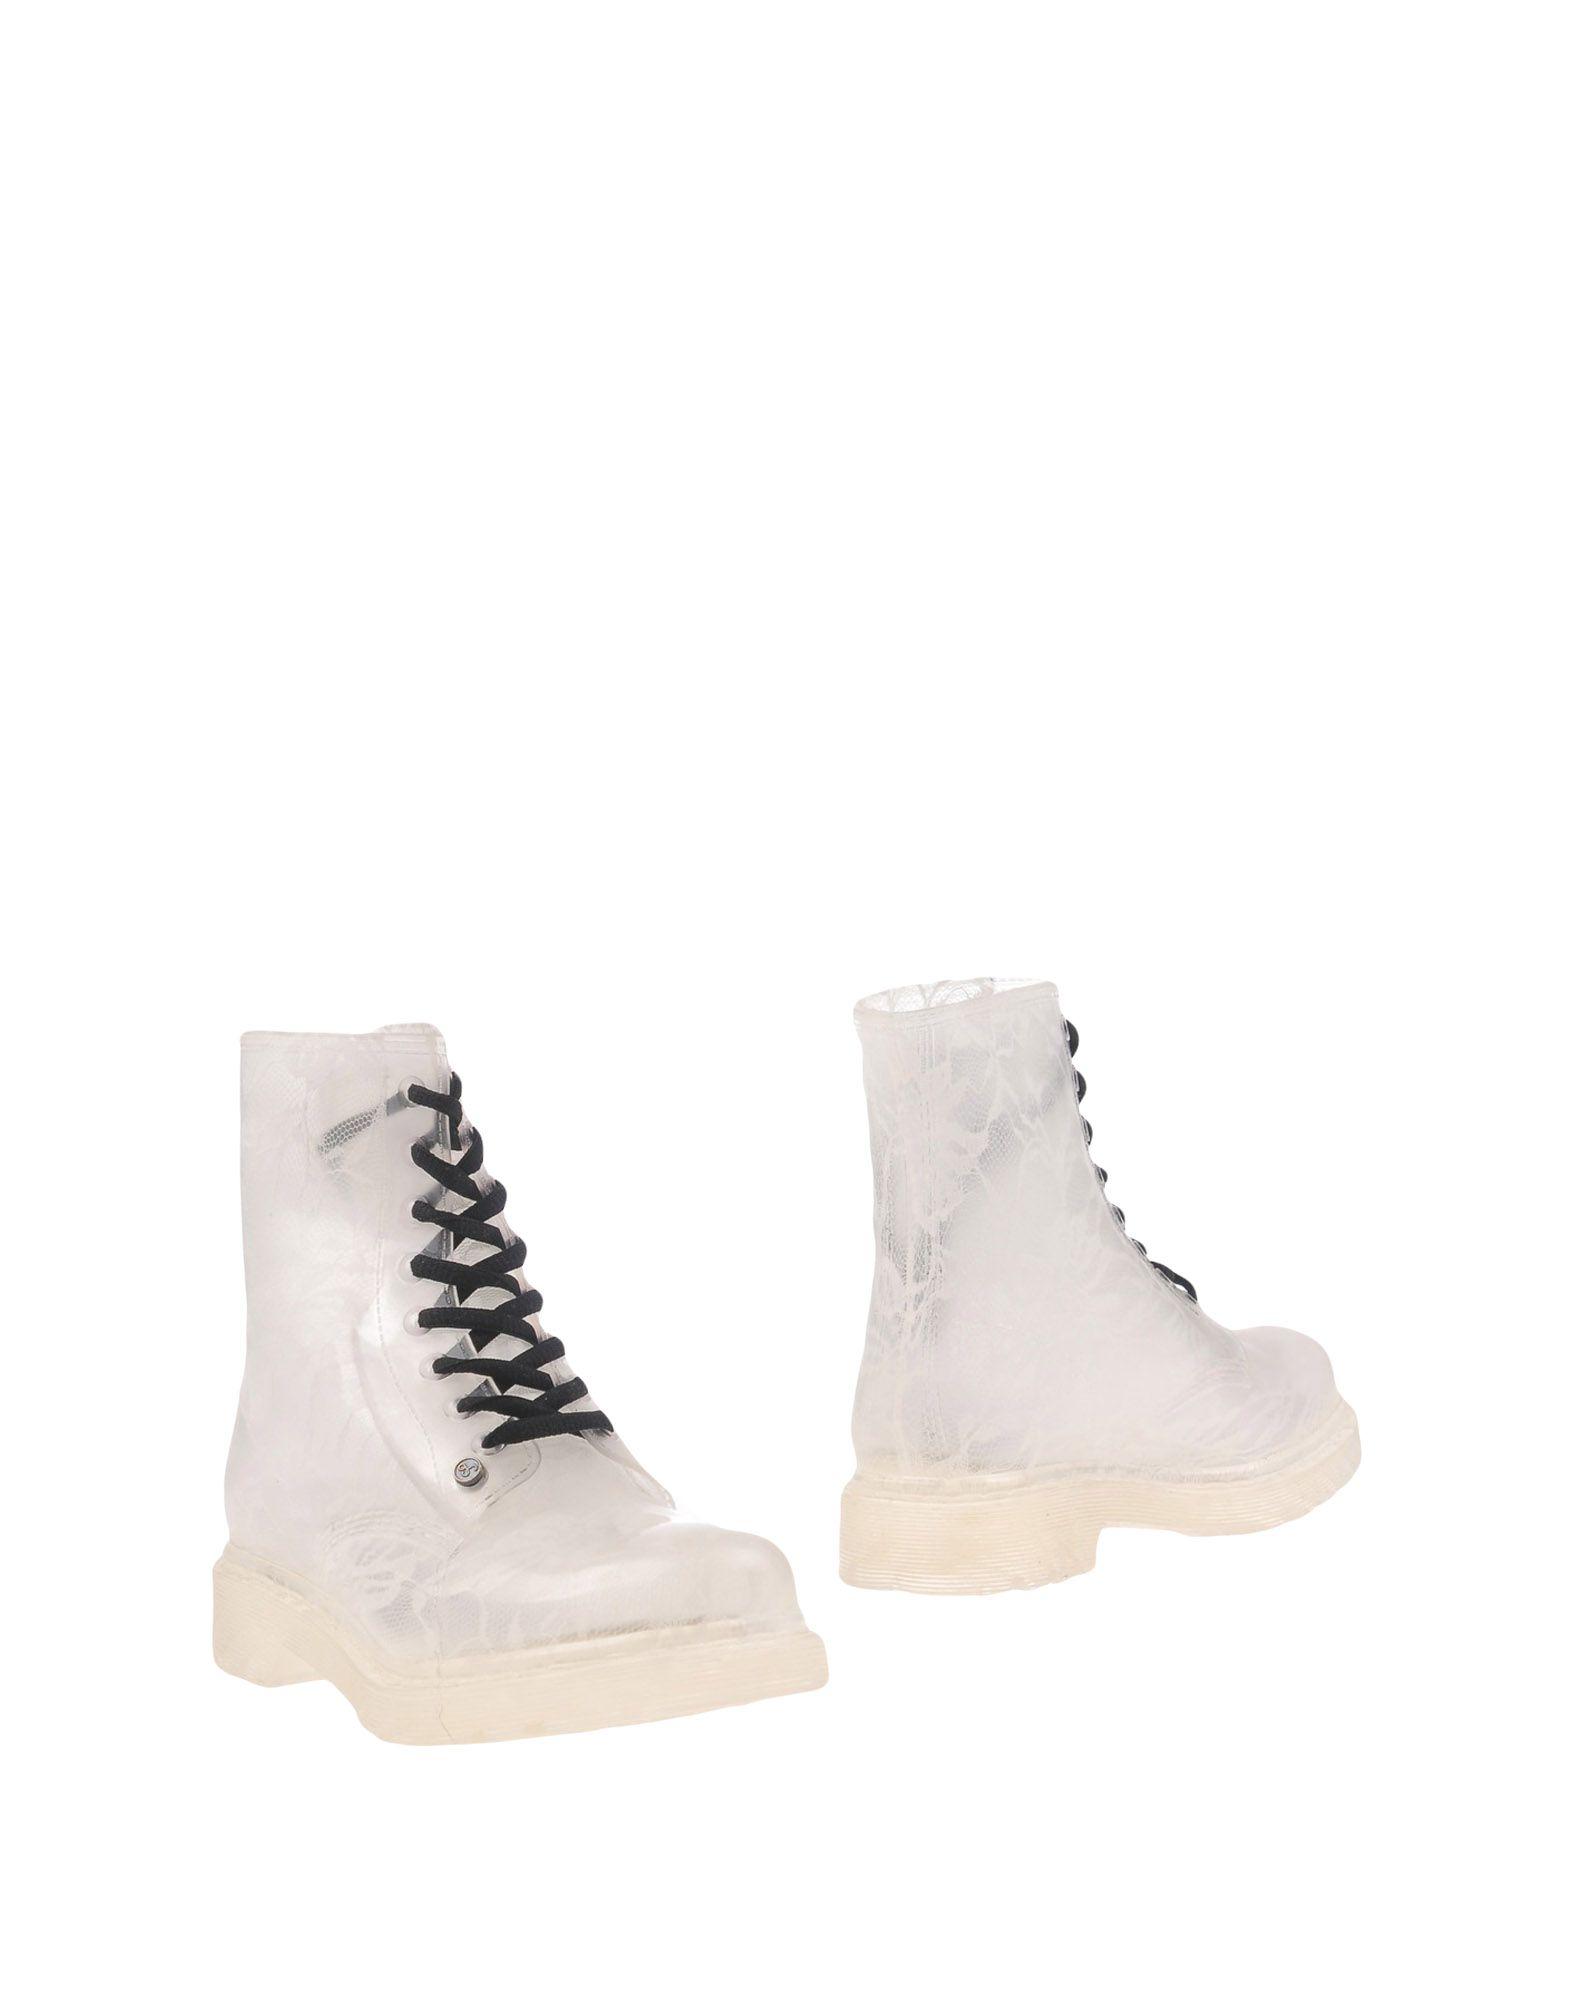 G•Six Stiefelette Workshop Stiefelette G•Six Damen  11293605TH Neue Schuhe f14edc